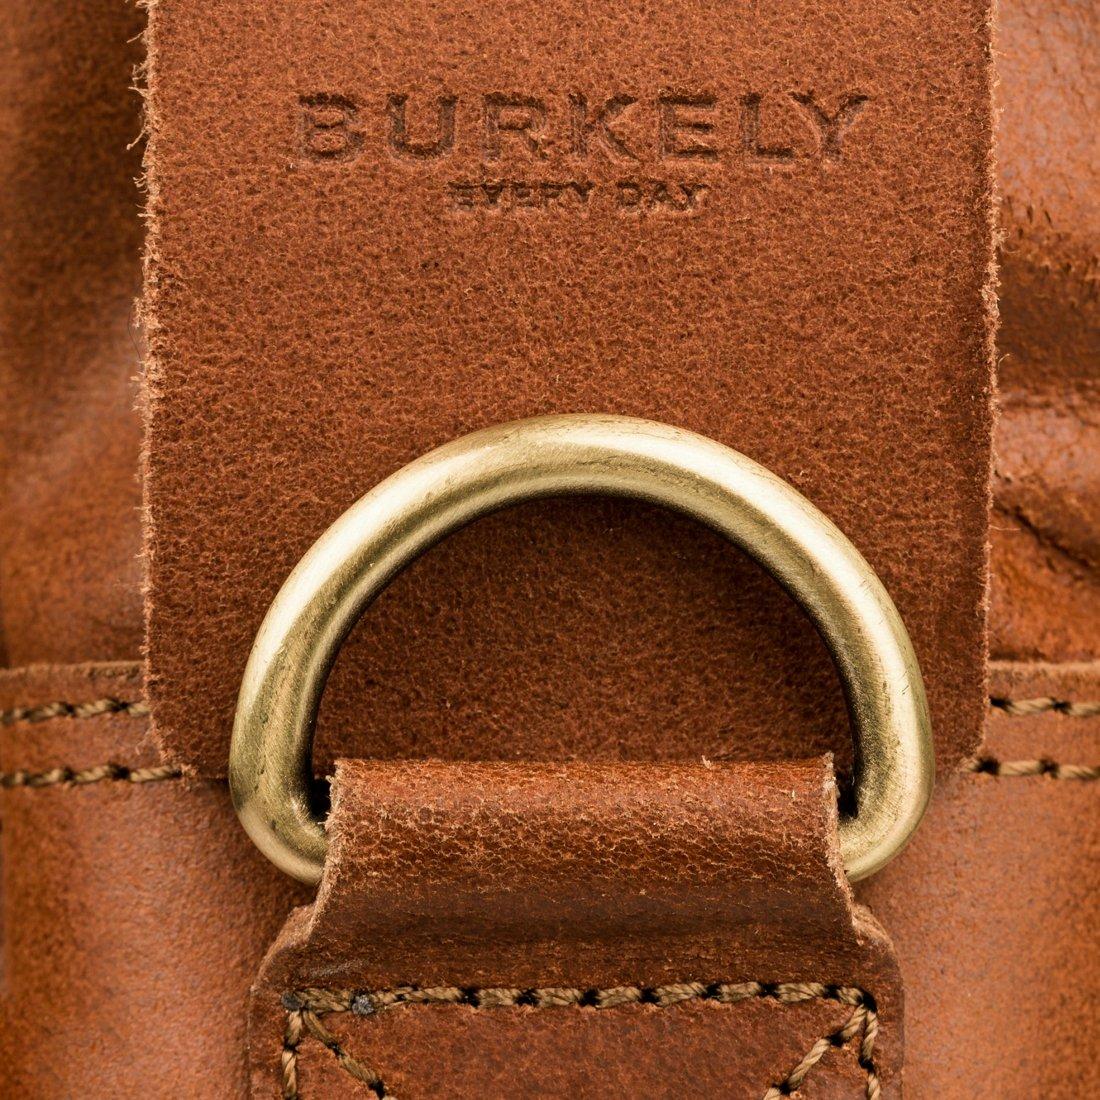 09f1fee2a30 Burkely Vintage Alex Worker 39 cm - koffer-direkt.de